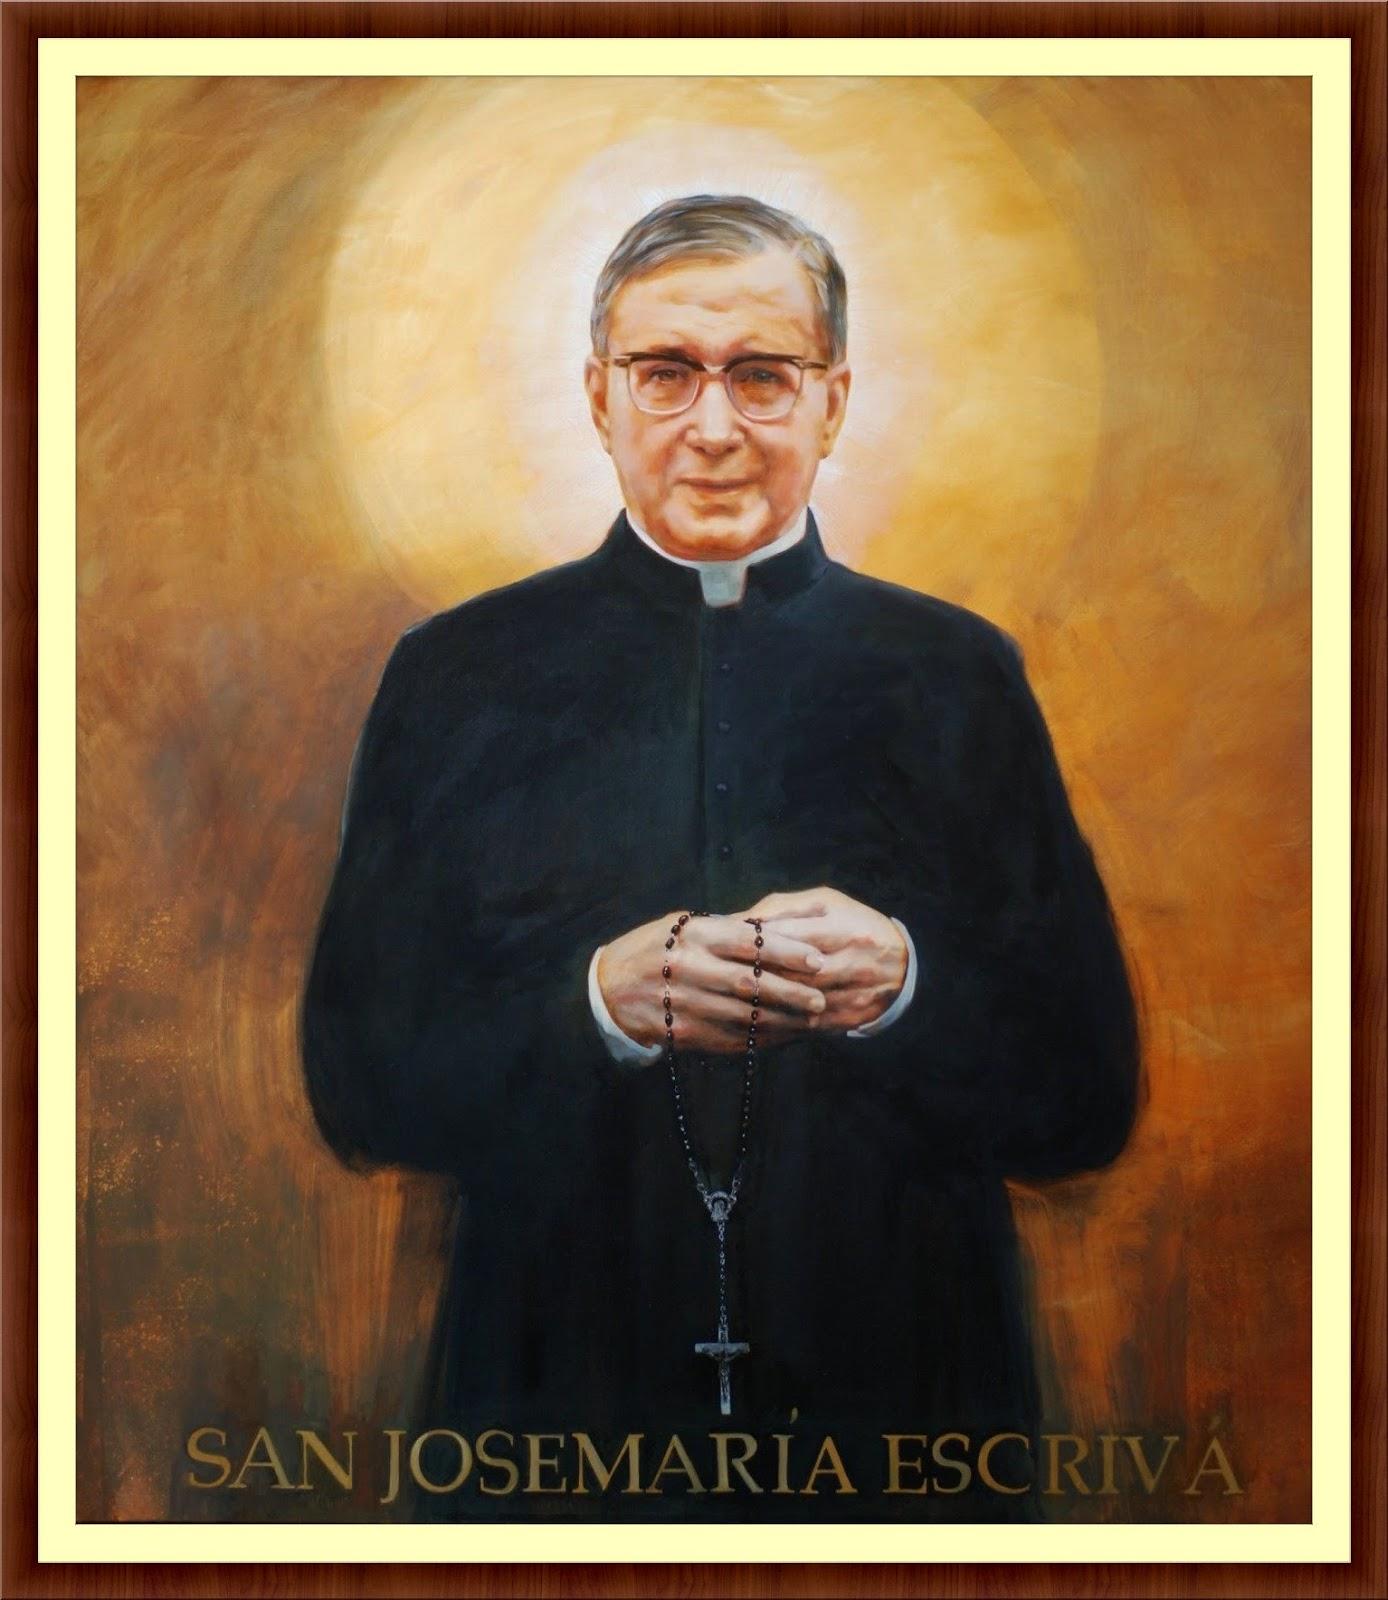 ALL SAINTS: ⛪ Saint Josemaria Escriva - Priest; Saint of Ordinary Life, Founder of Opus Dei